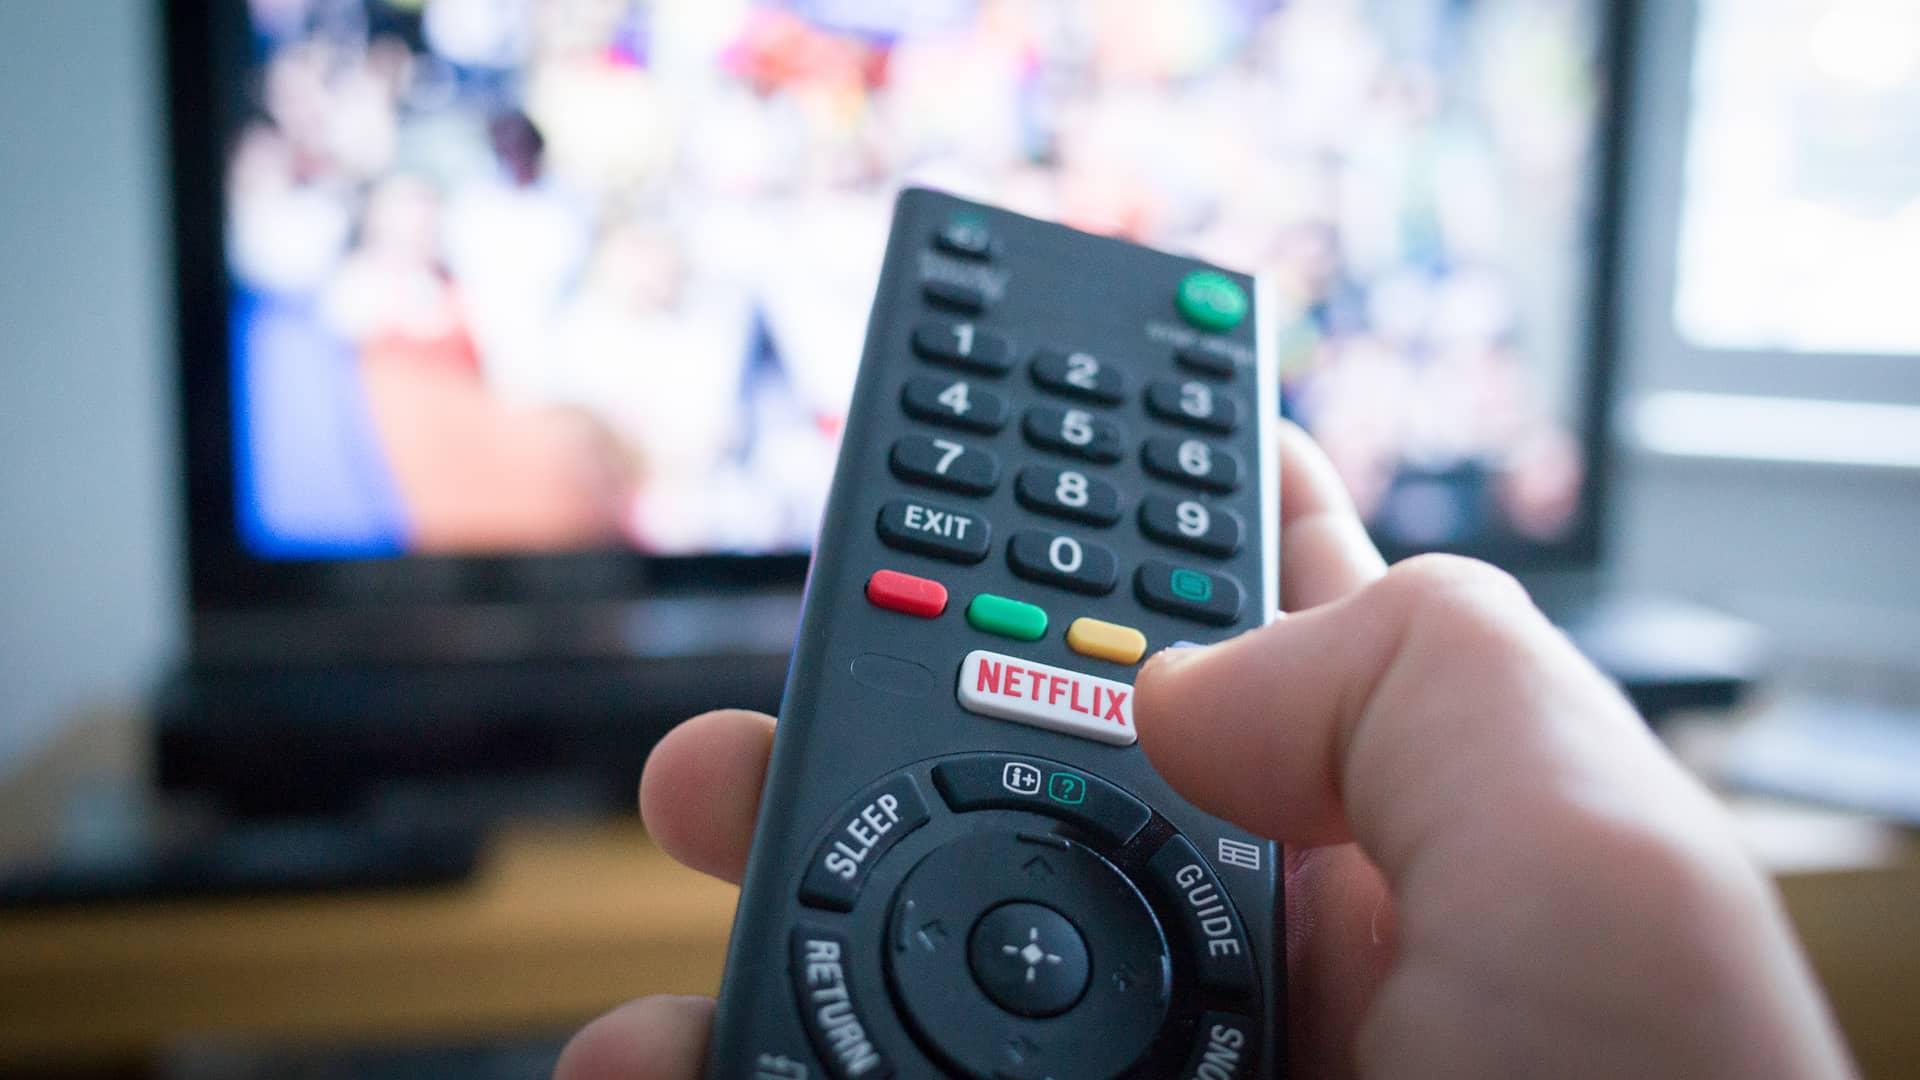 TV con Control remoto con botón de Netflix